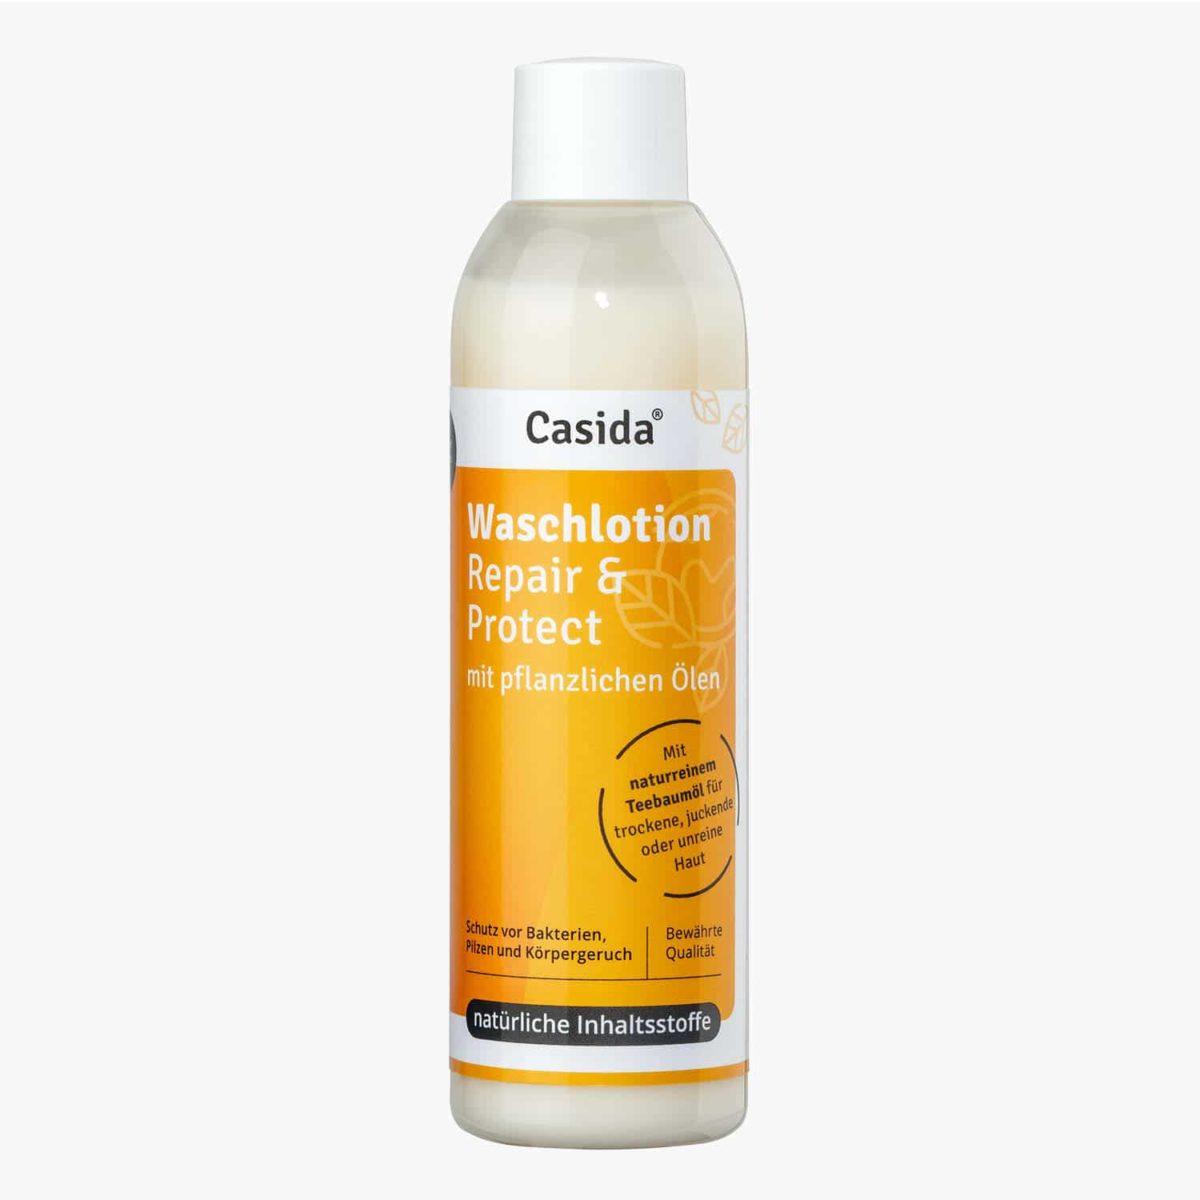 Casida Waschlotion Repair & Protect 200 ml 13168379 PZN Apotheke Nagelpilz Fußpilz